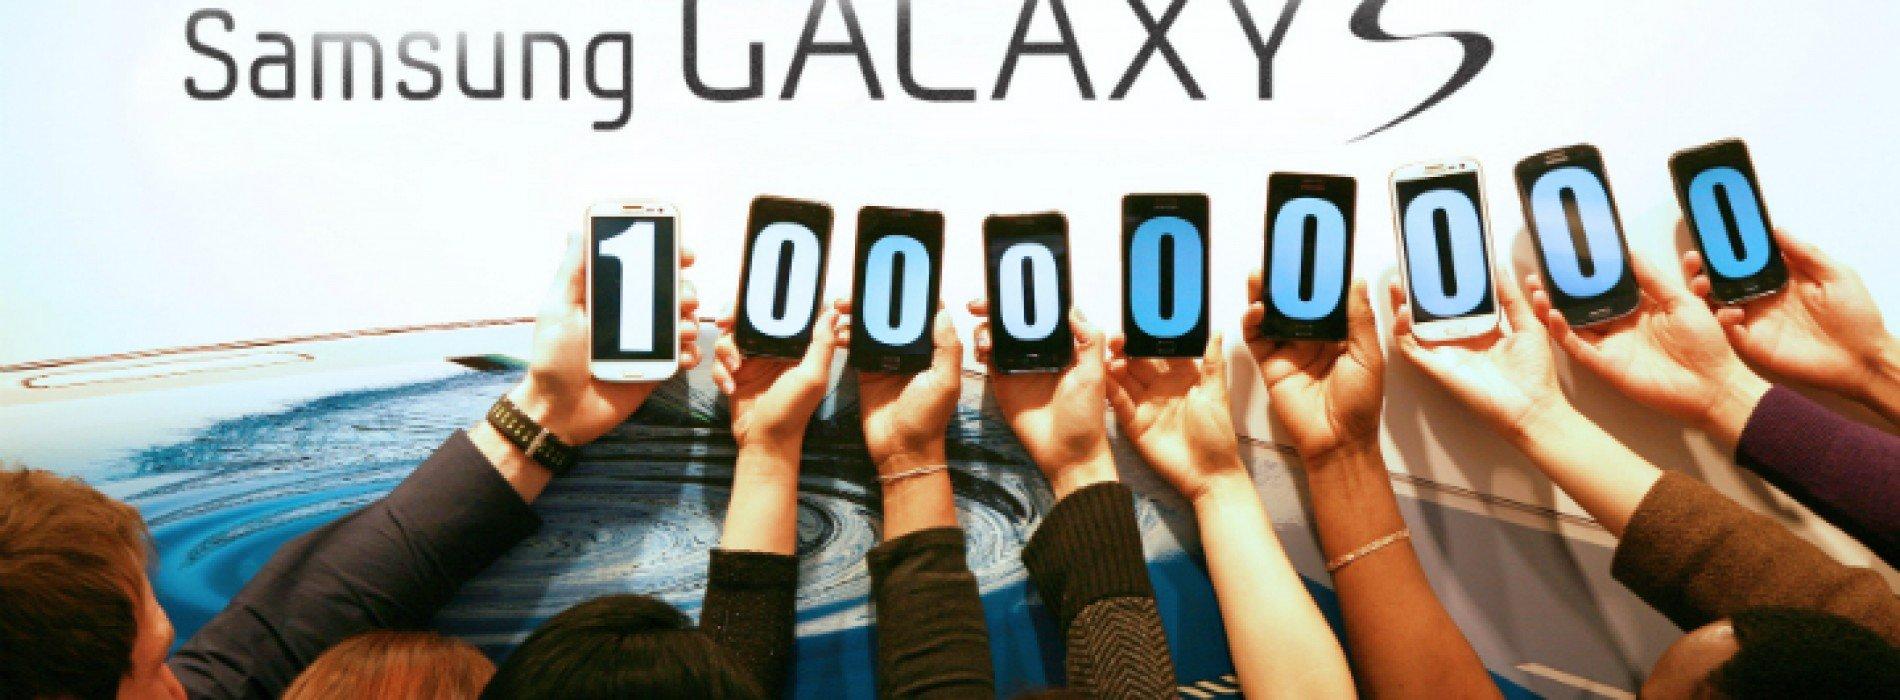 Samsung Galaxy S III surpasses 40 million in global sales